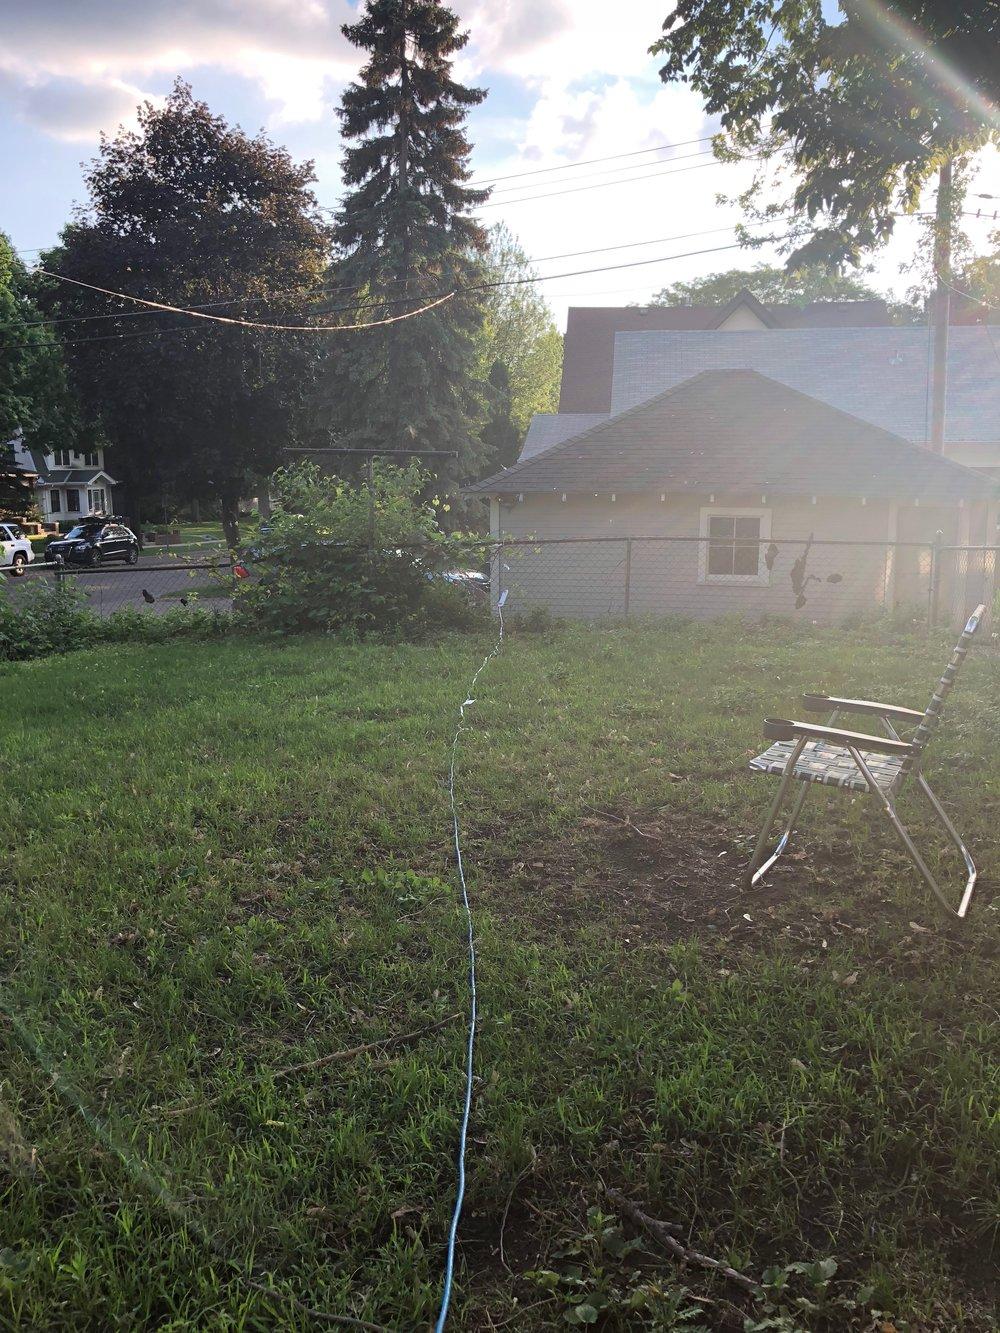 extension cord backyard